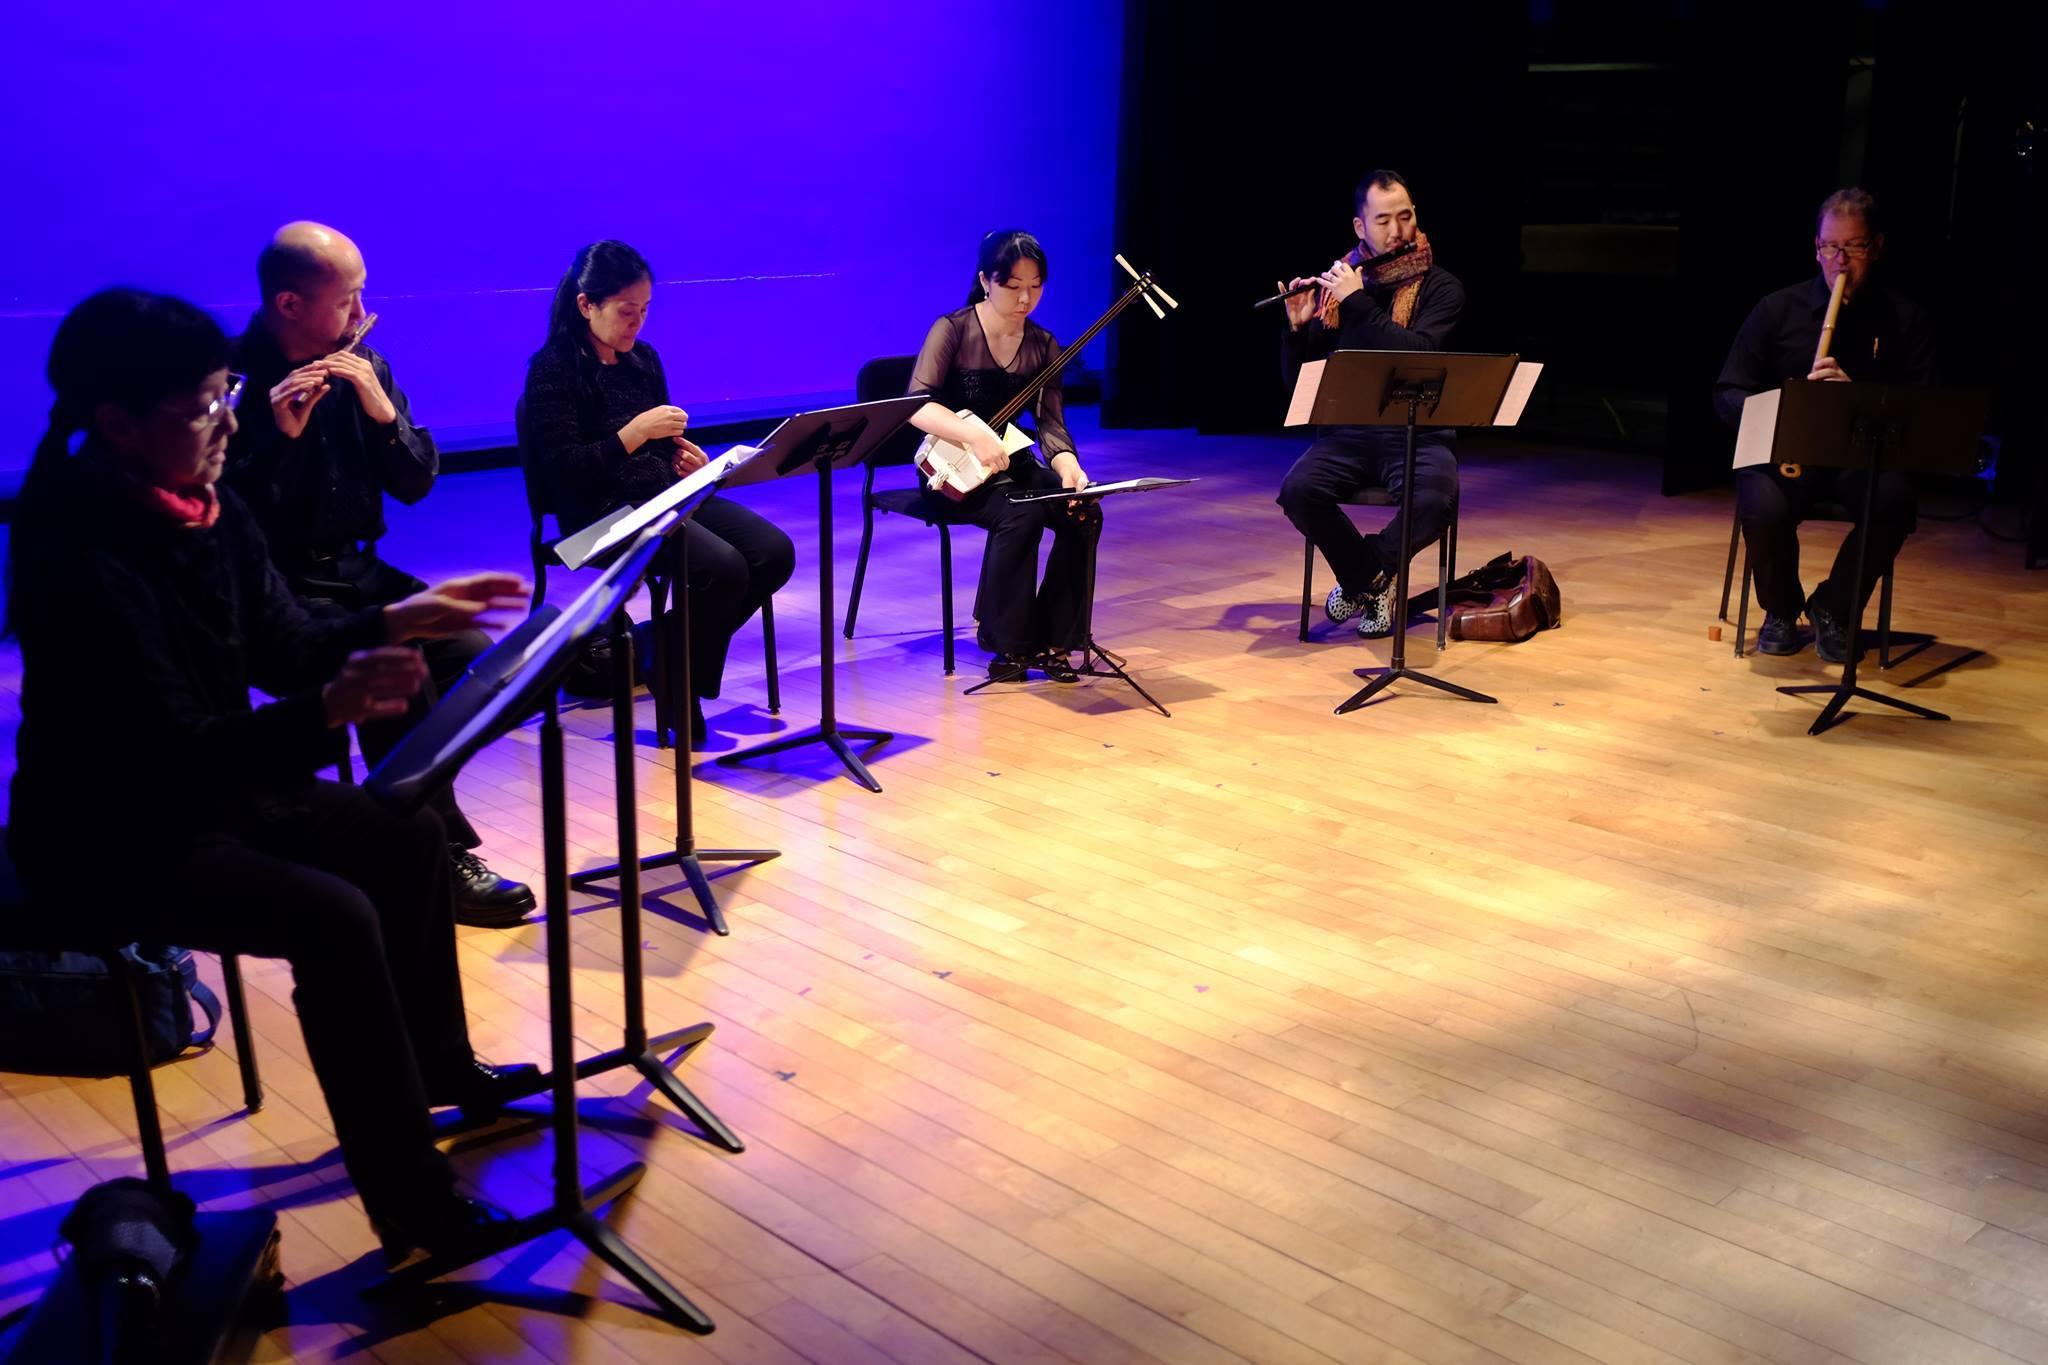 From gagaku concert @ Columbia University © Marty Regan